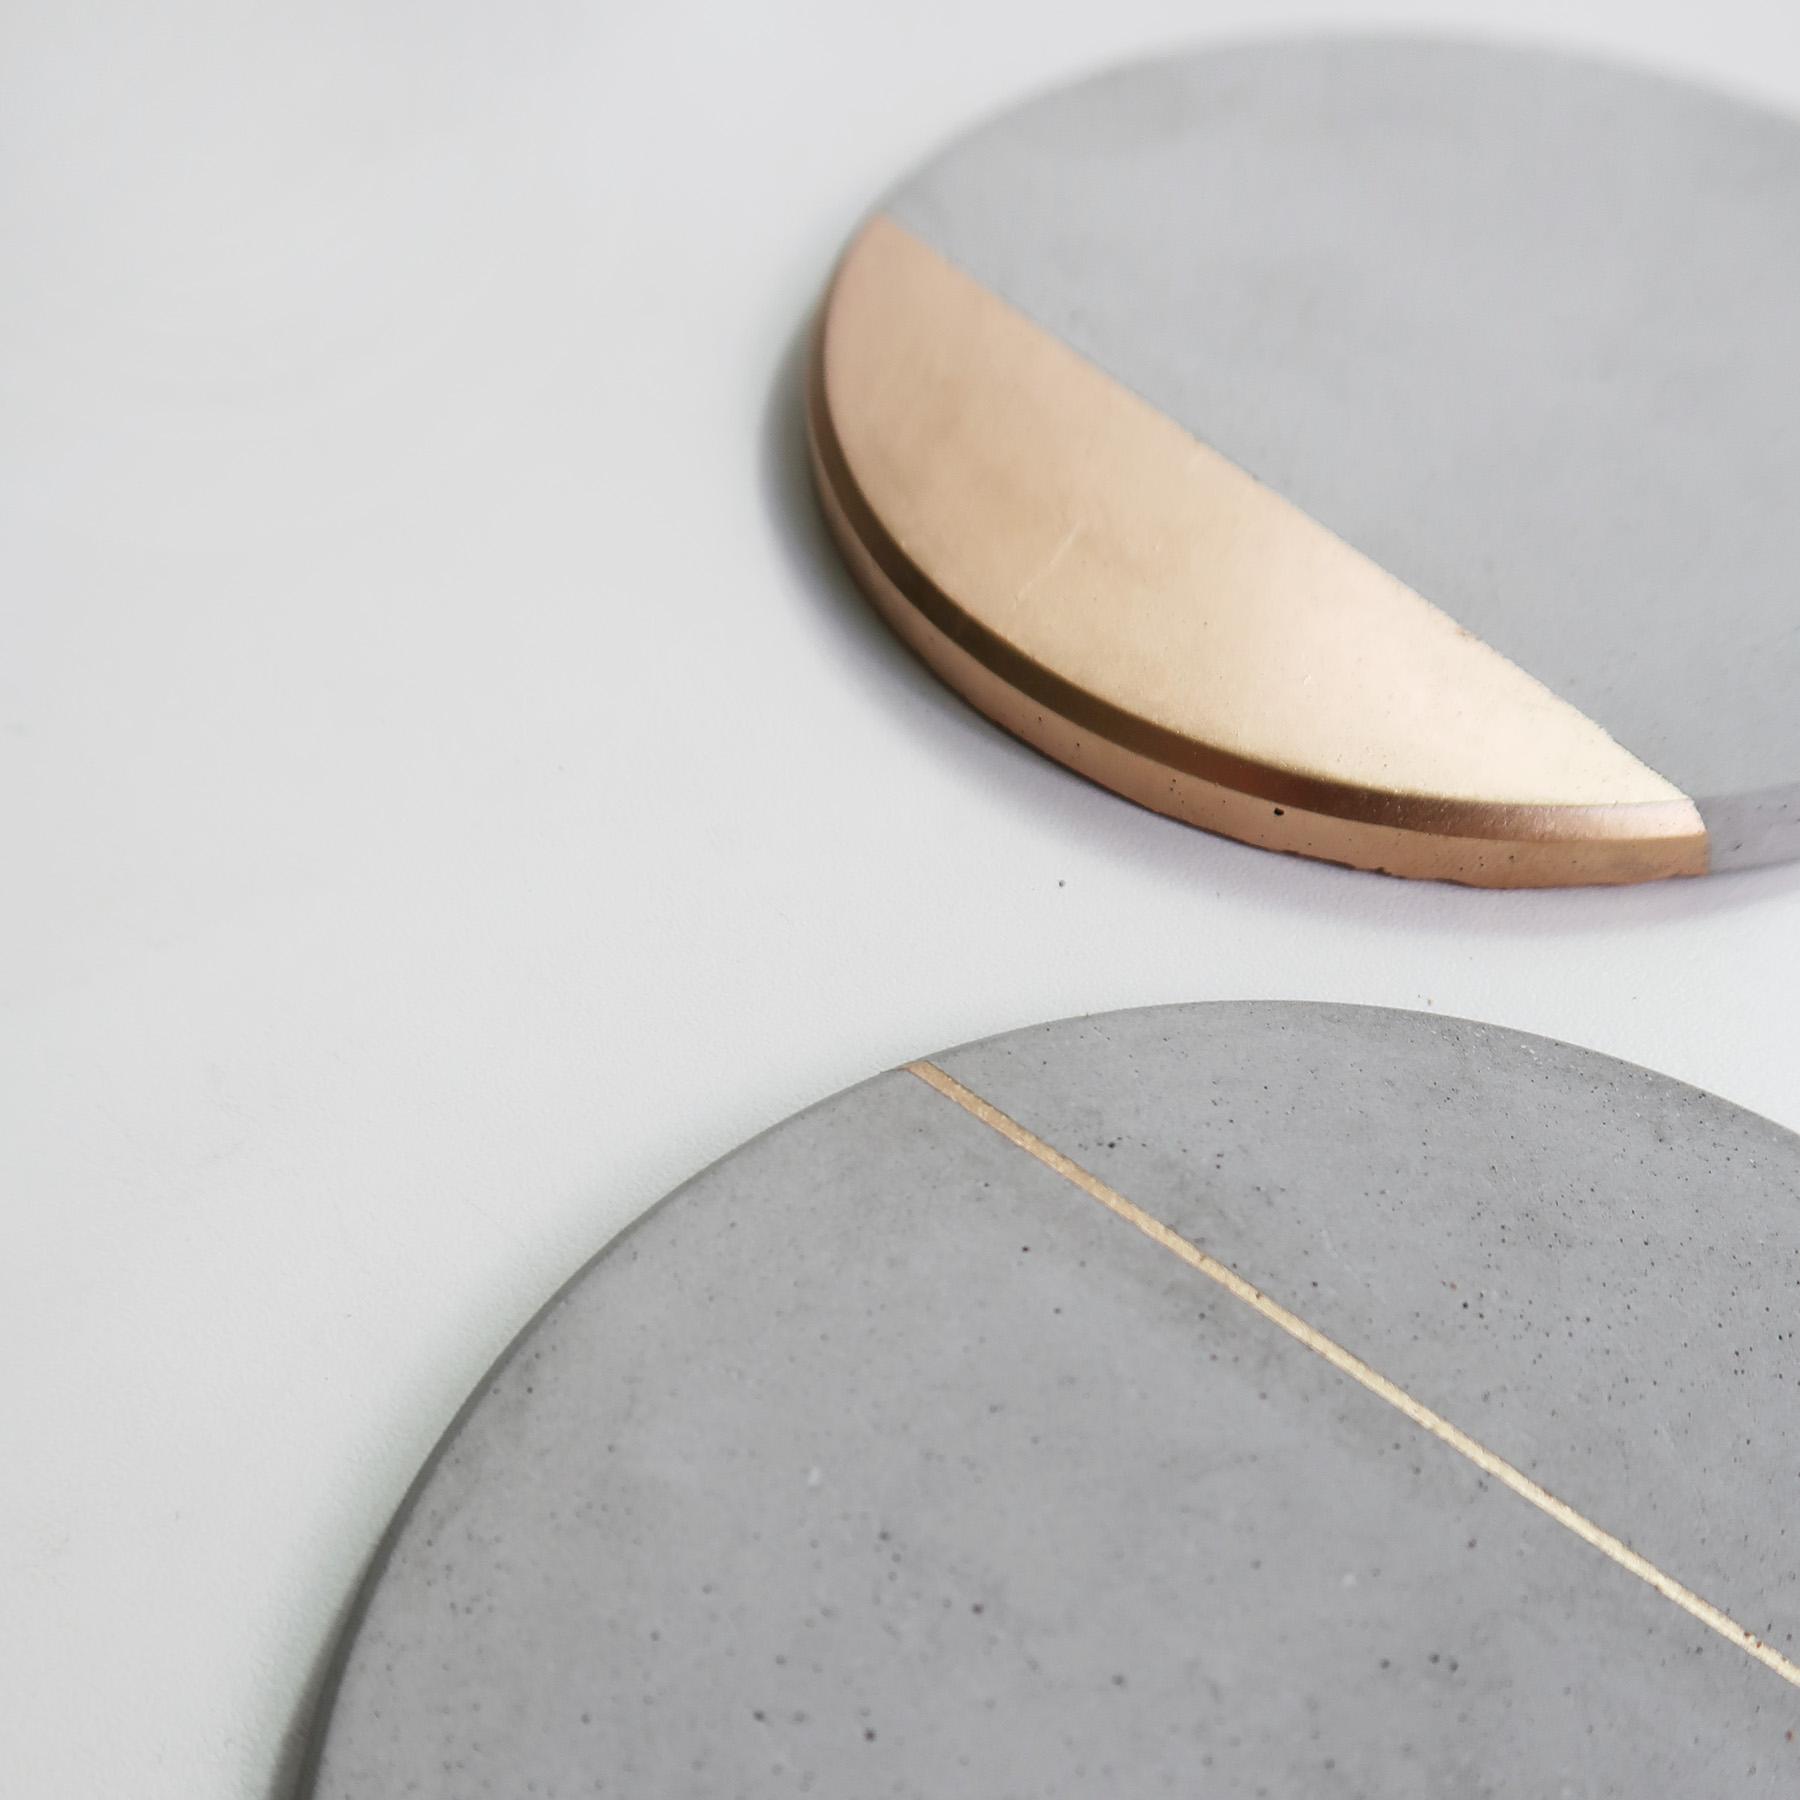 Concrete Design 月蝕金邊倒角設計水泥吸水圓墊・杯墊・飾品盤